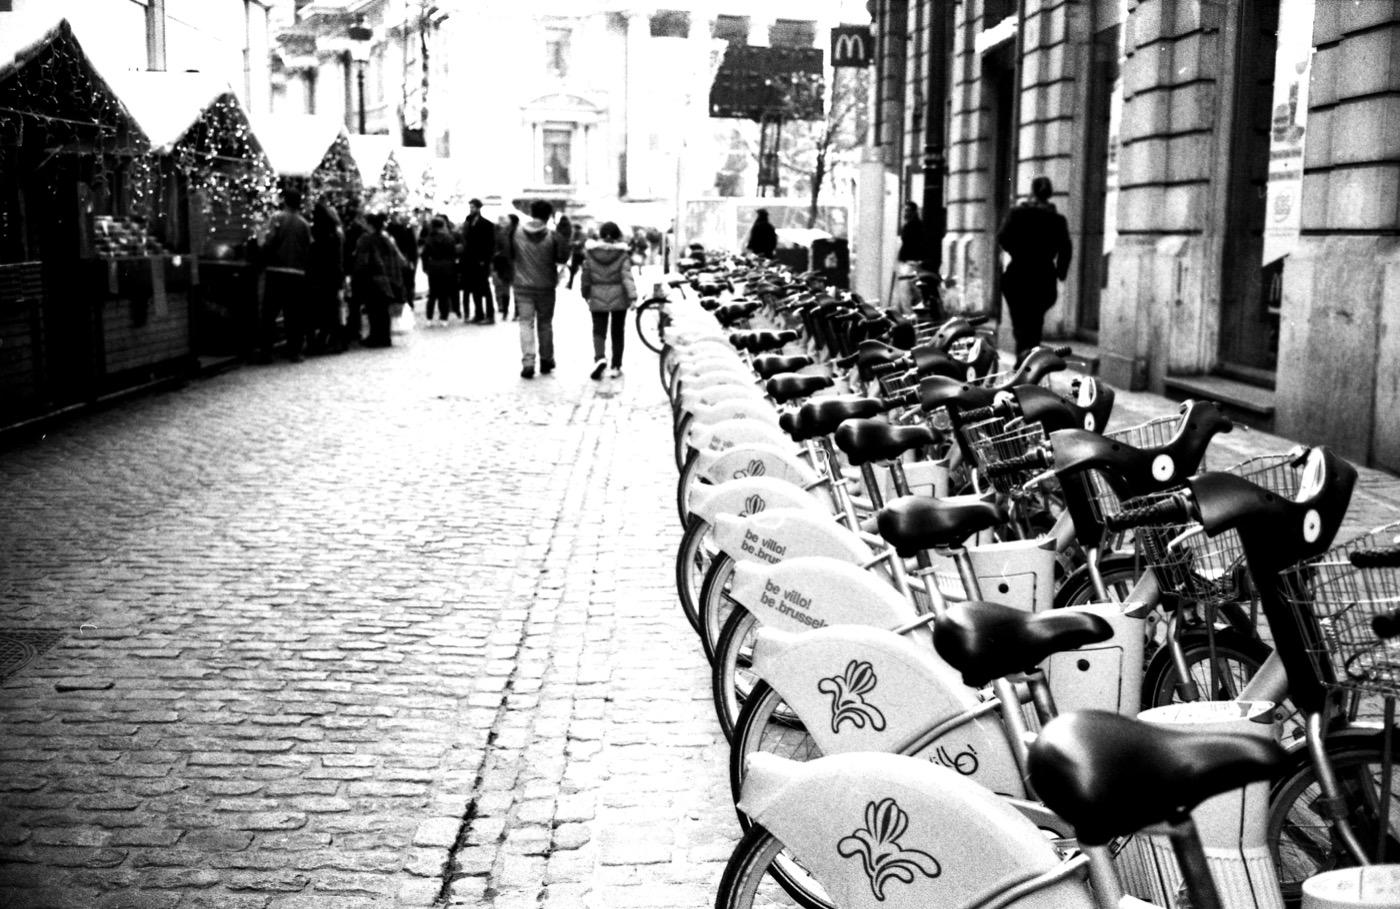 Brussels Bikes